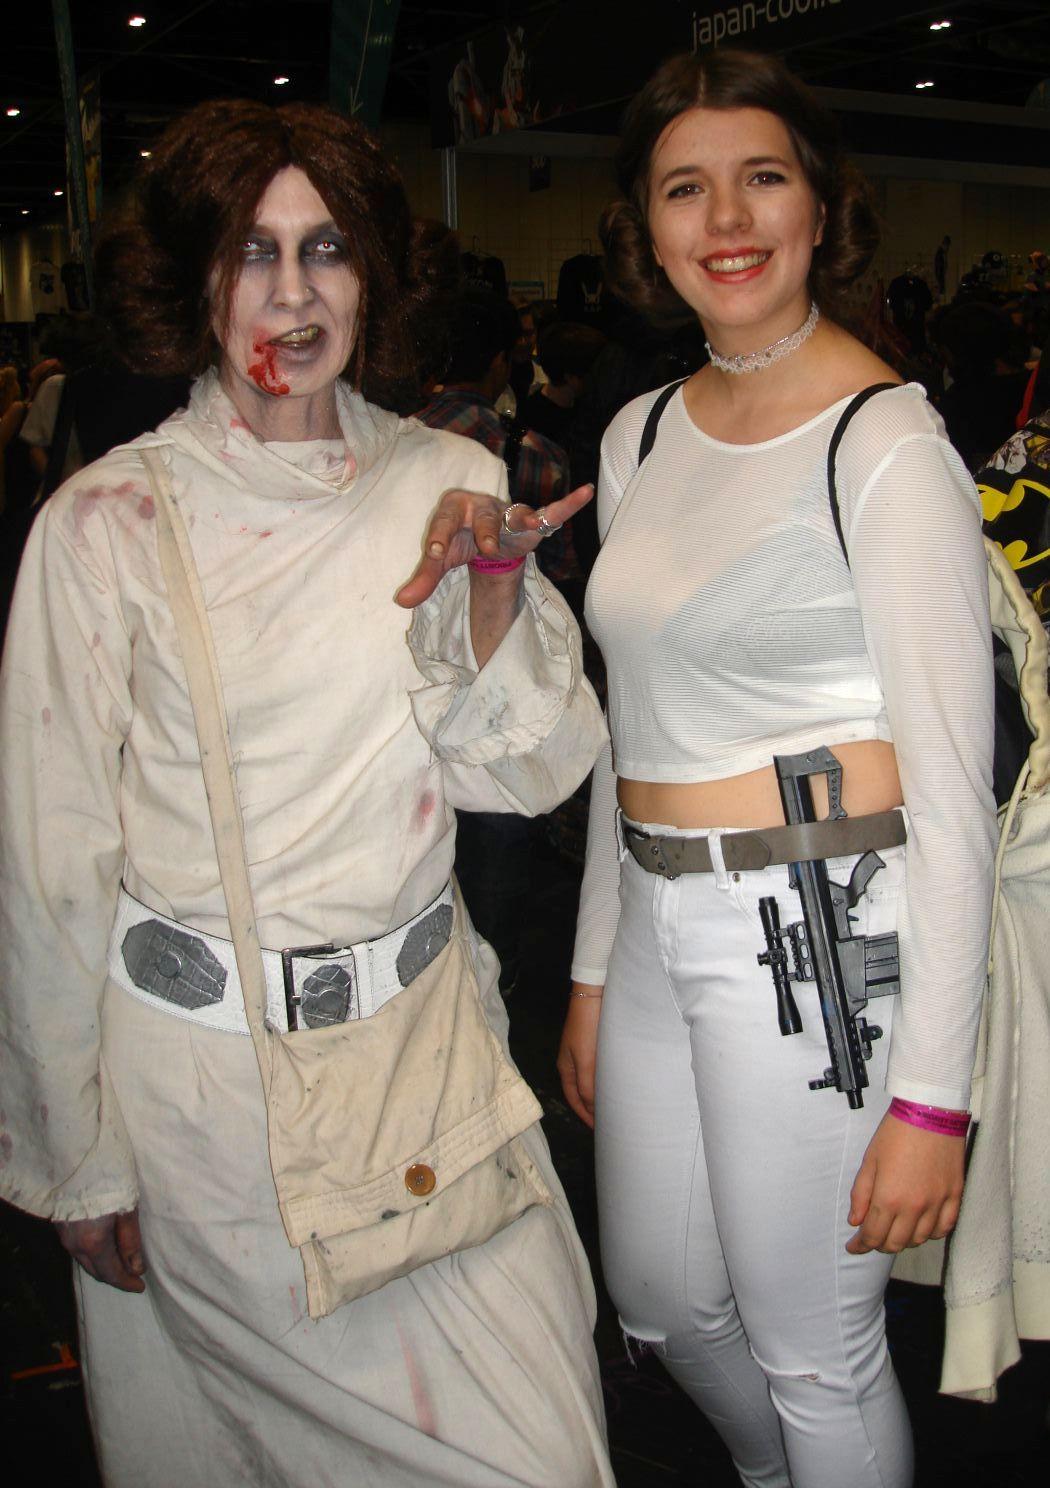 Zombie Princess Leia & Leia - MCM Comic Con London October 2015